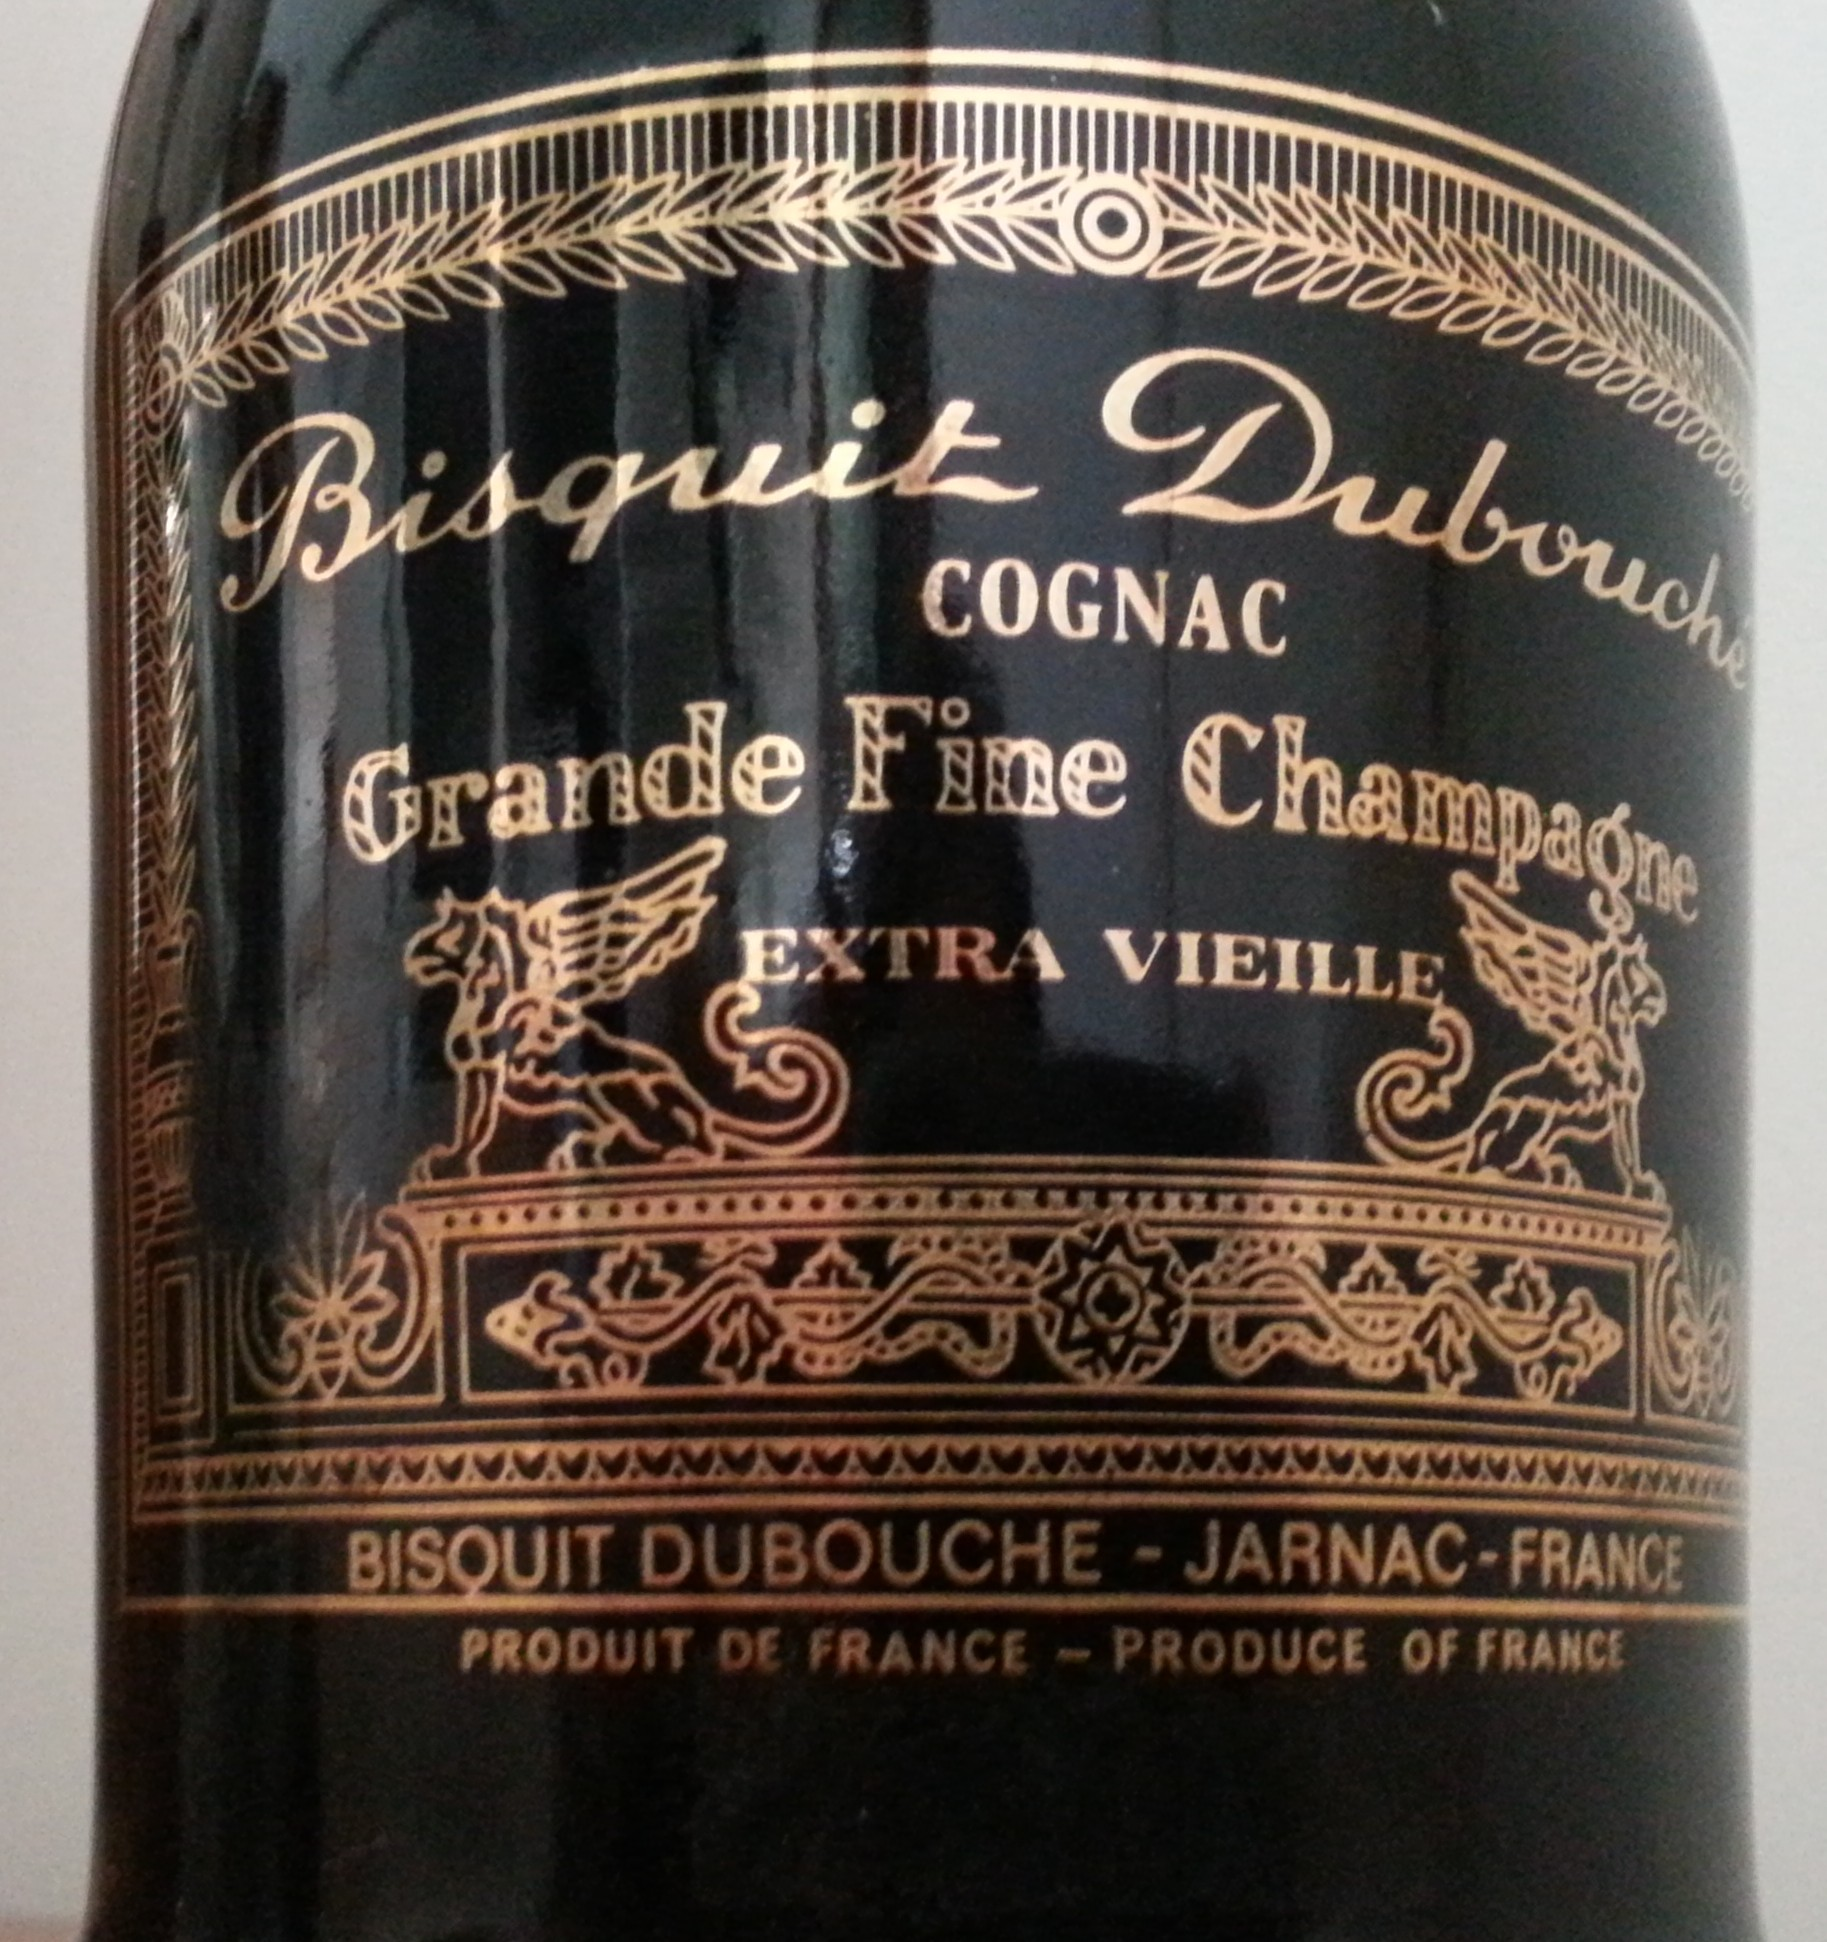 Bisquit Grande Fine Champagne Cognac Extra Vieille